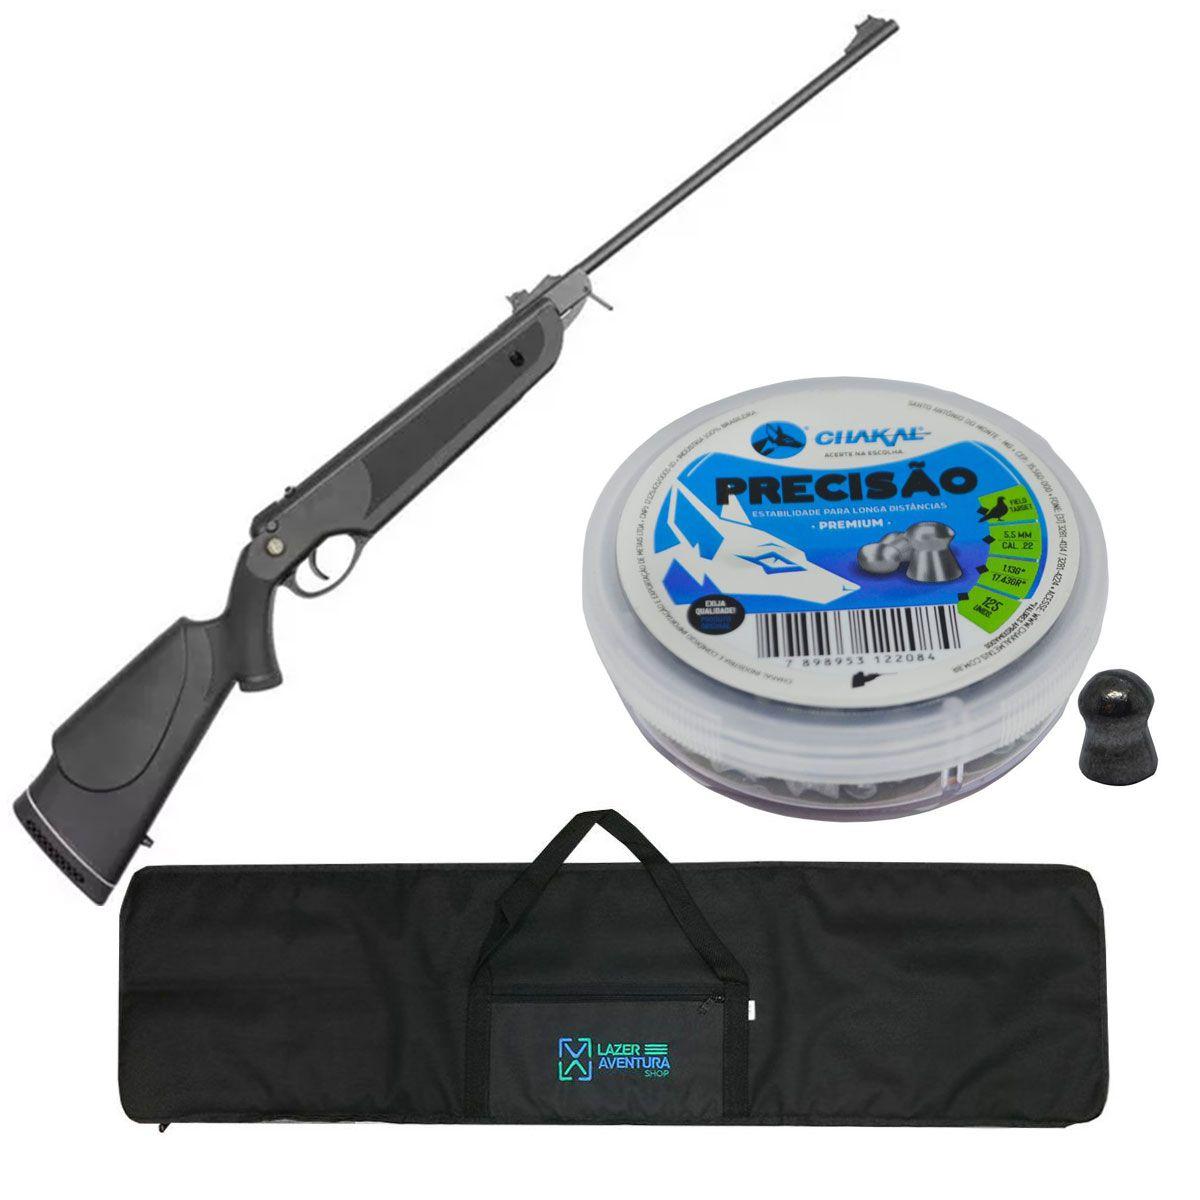 Kit Carabina Dione 5,5mm + Chumbinho 5,5mm + Capa Lazer e Aventura